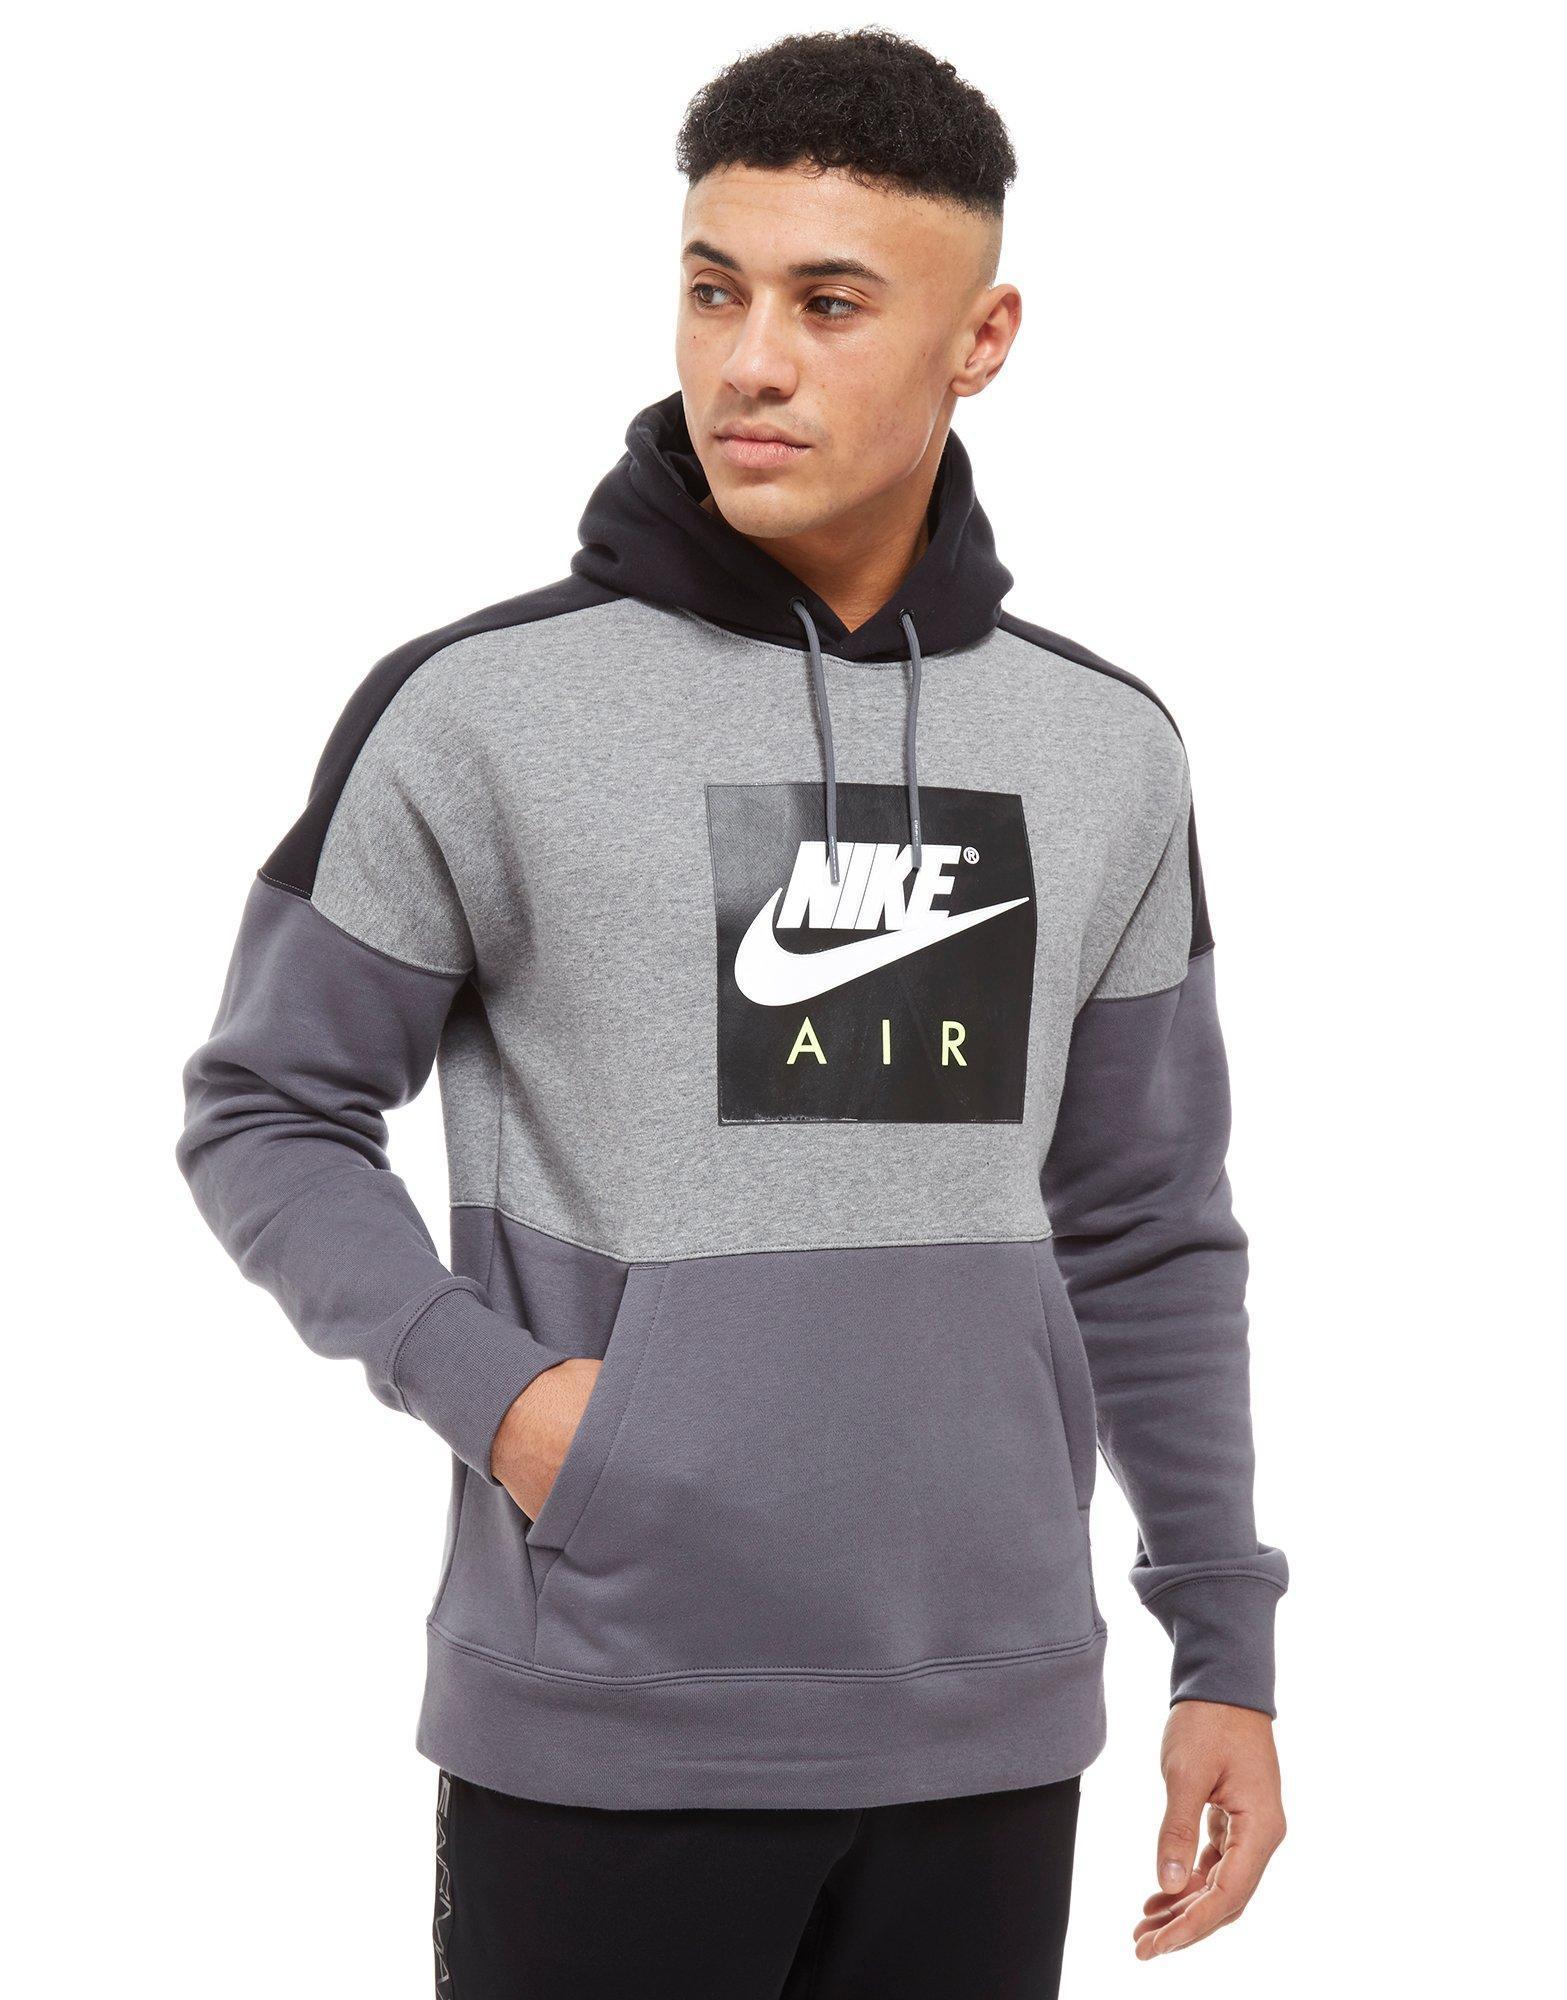 Nike Air Overhead Colourblock Hoodie in Gray for Men - Lyst